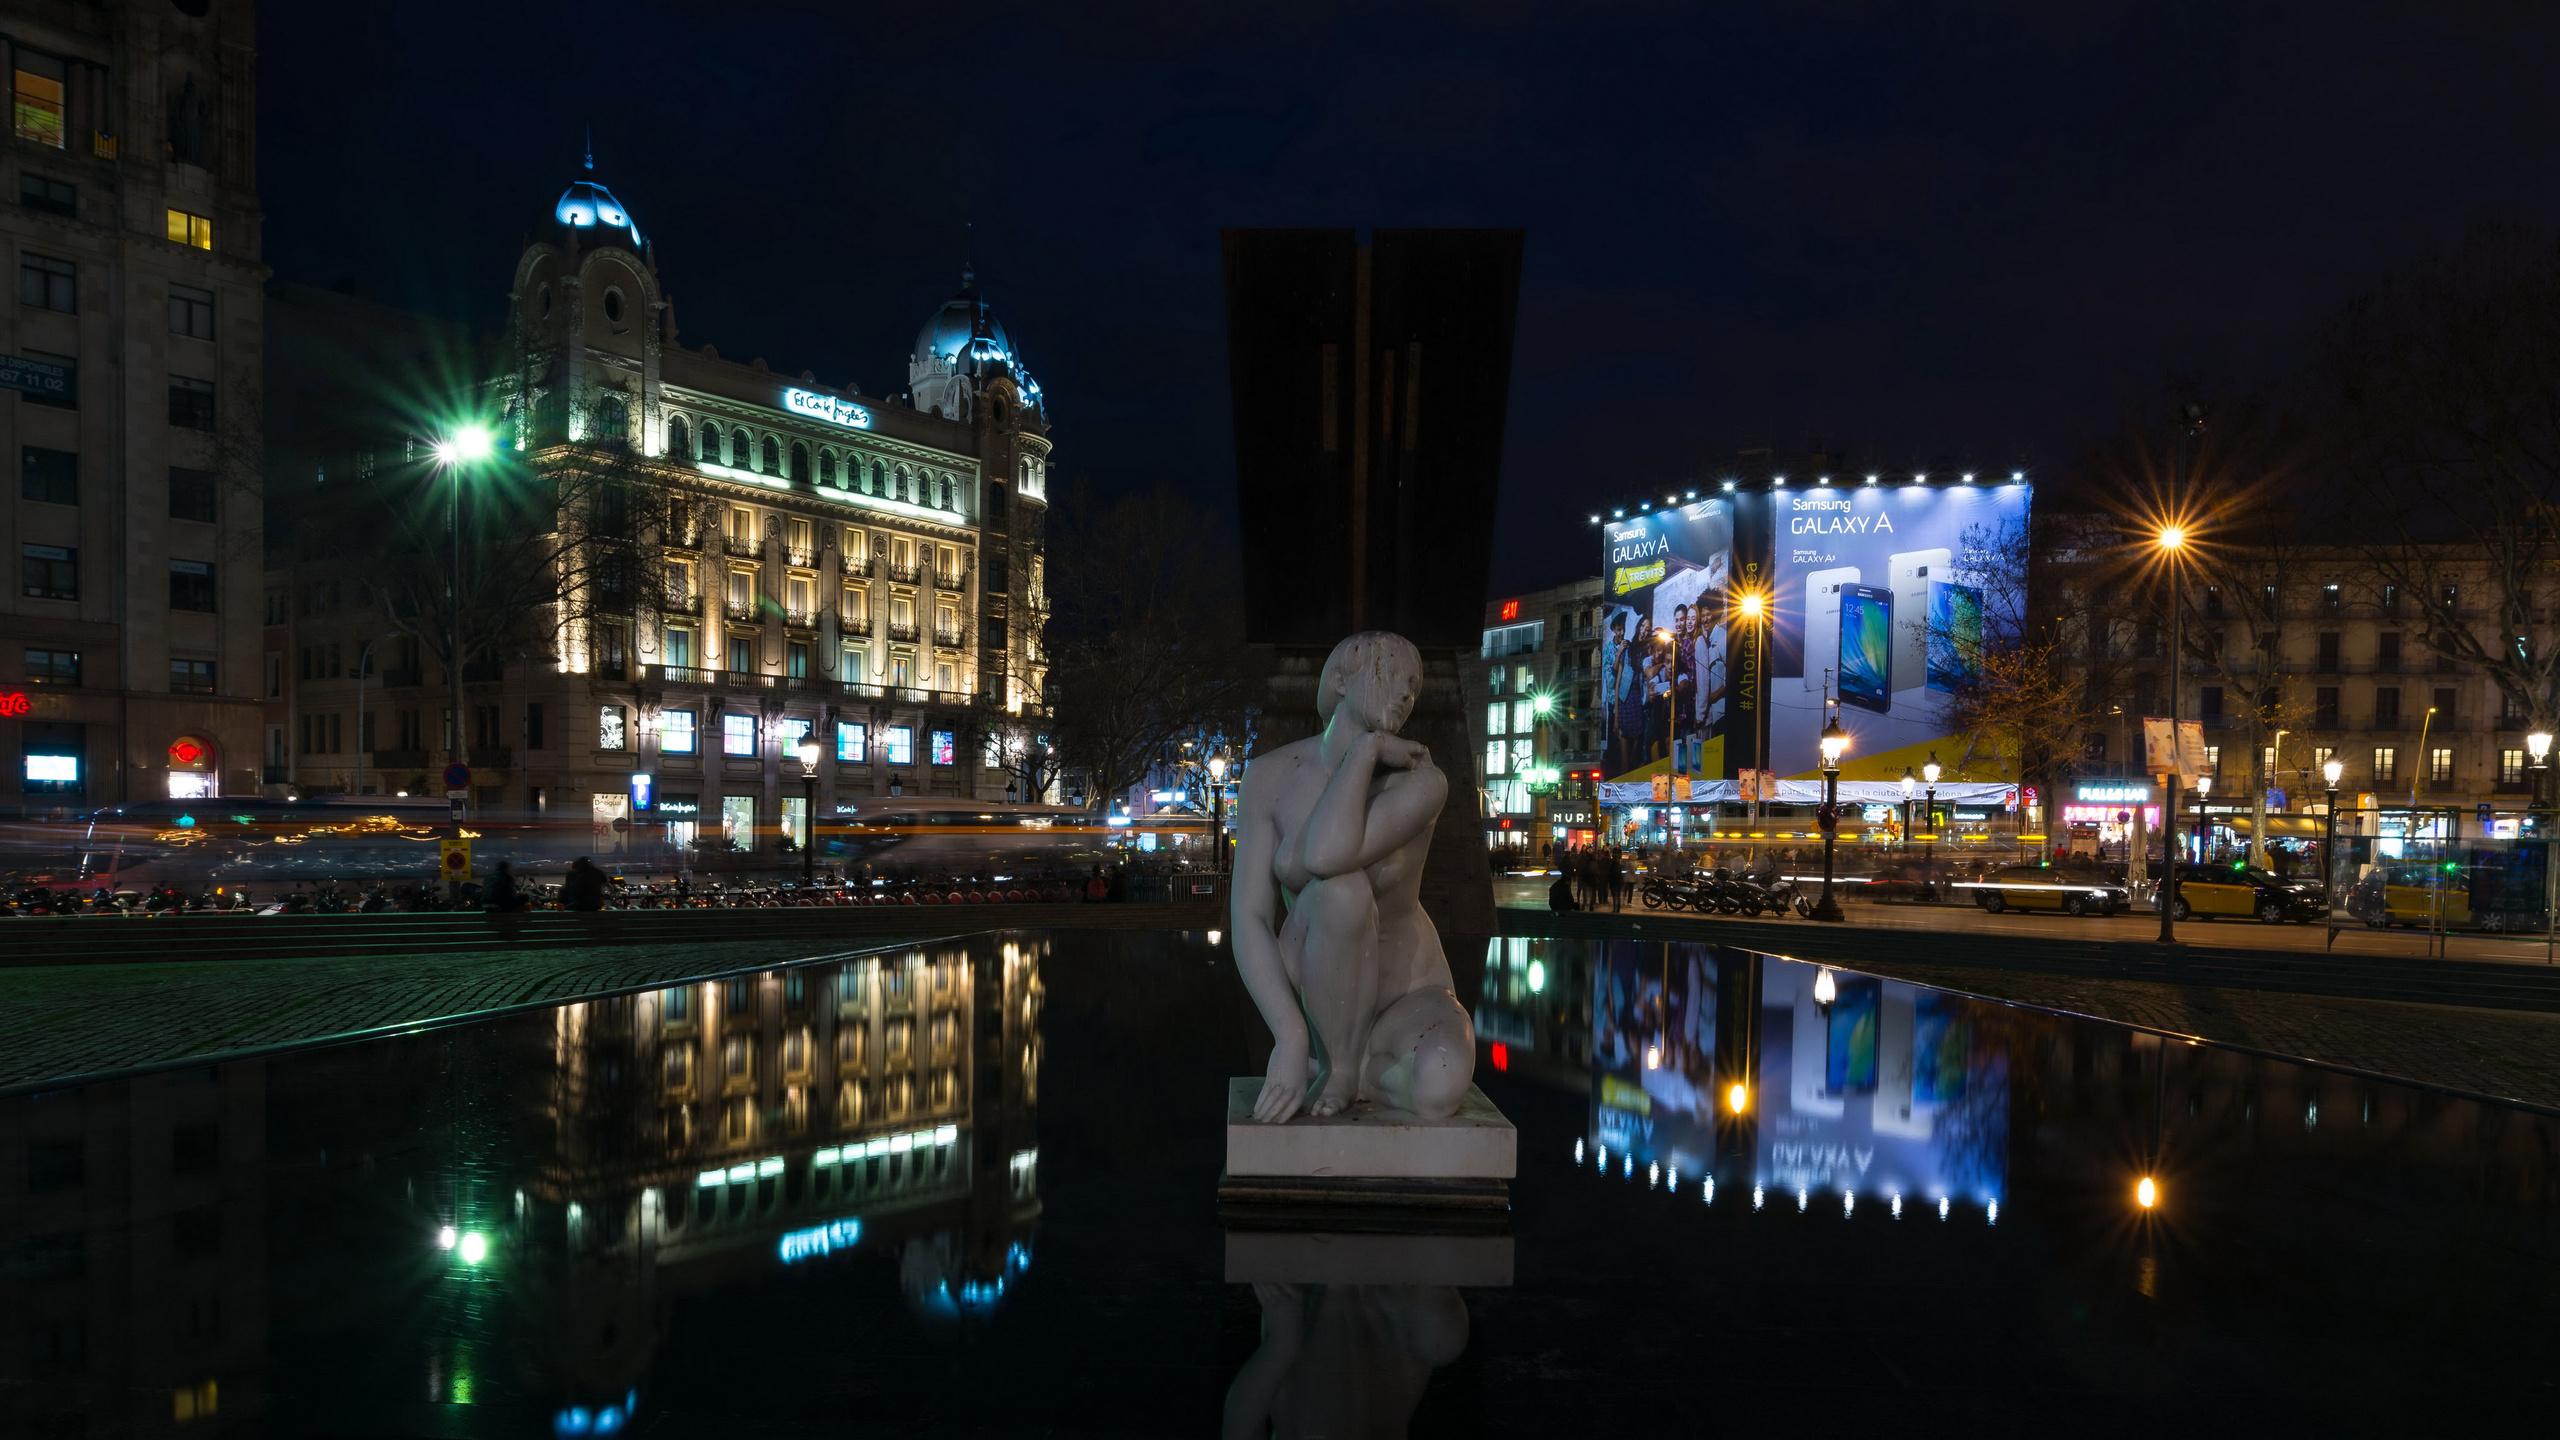 испания, дома, скульптура, барселона, фонари, ночь город